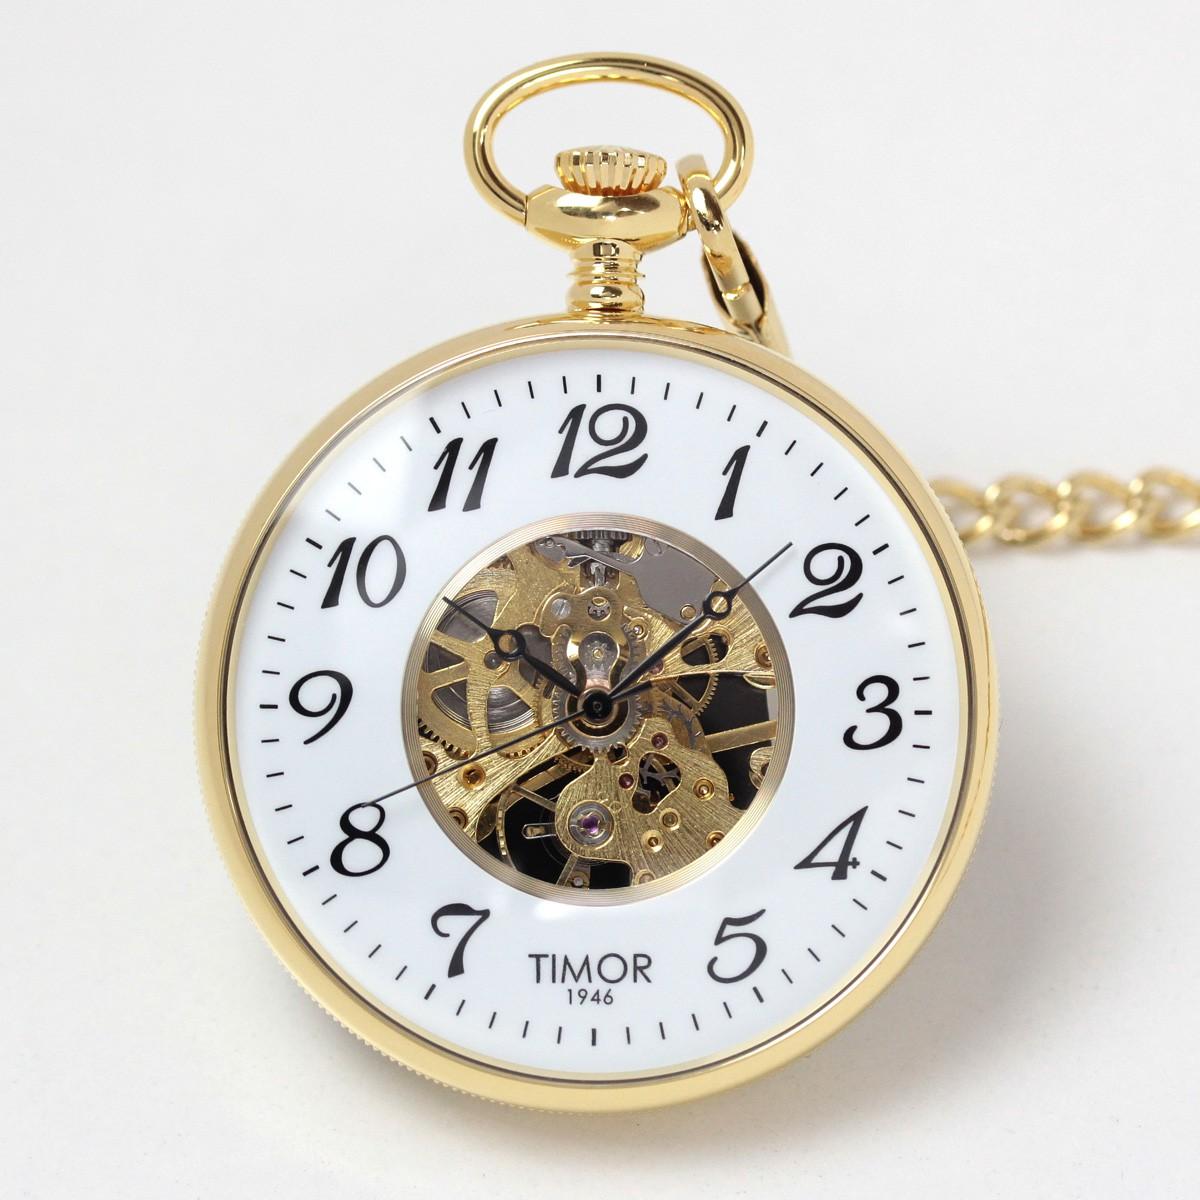 Timor(ティモール) オープンフェイス スケルトン 懐中時計 ゴールドカラー TP103JA02